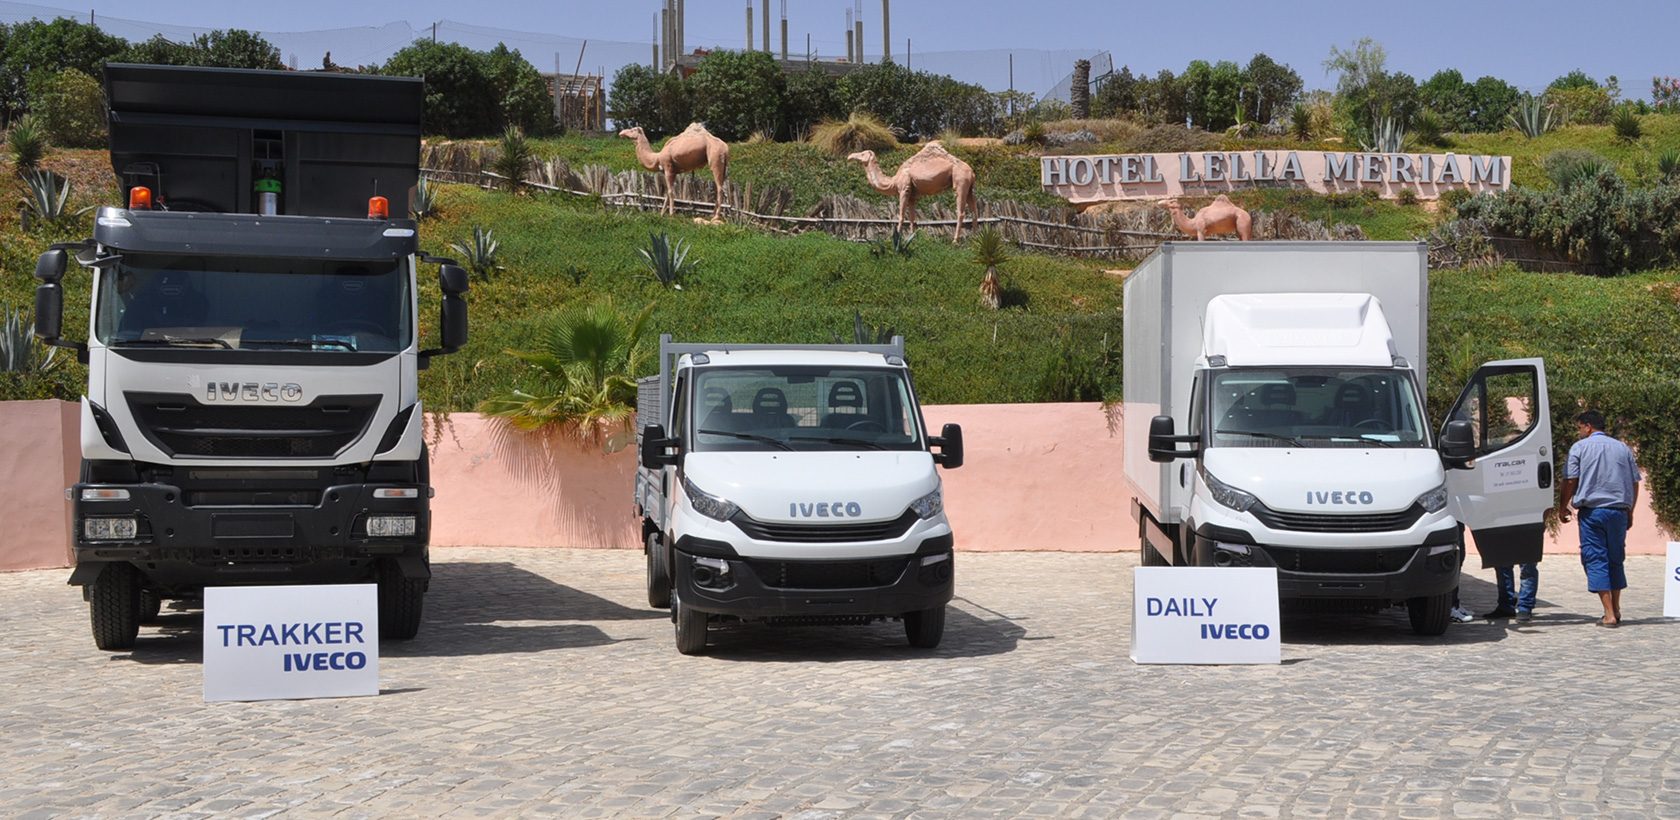 Journée Porte ouverte IVECO à Zarzis